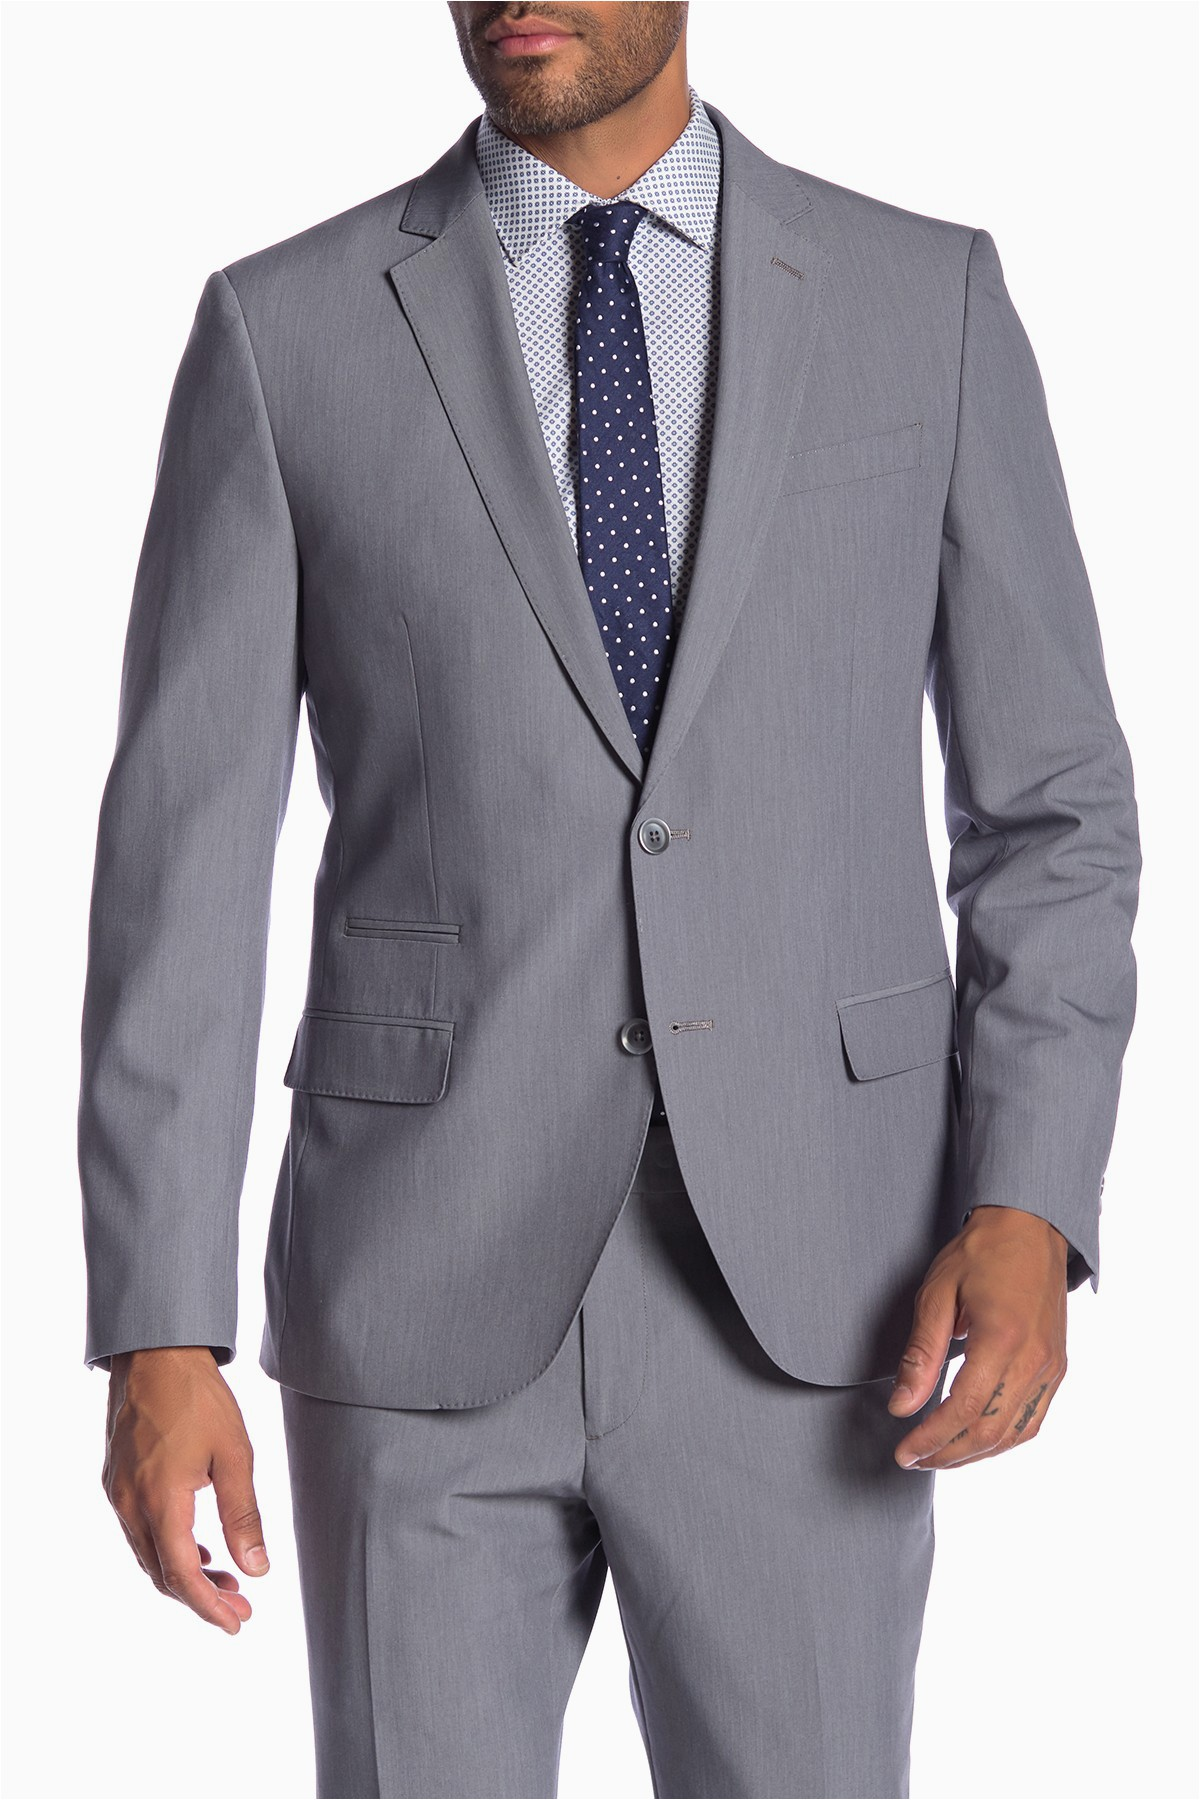 Savile Row Bath Rugs Savile Row Co Avedon Grey Two button Notch Lapel Slim Fit Bi Stretch Suit Separate Jacket